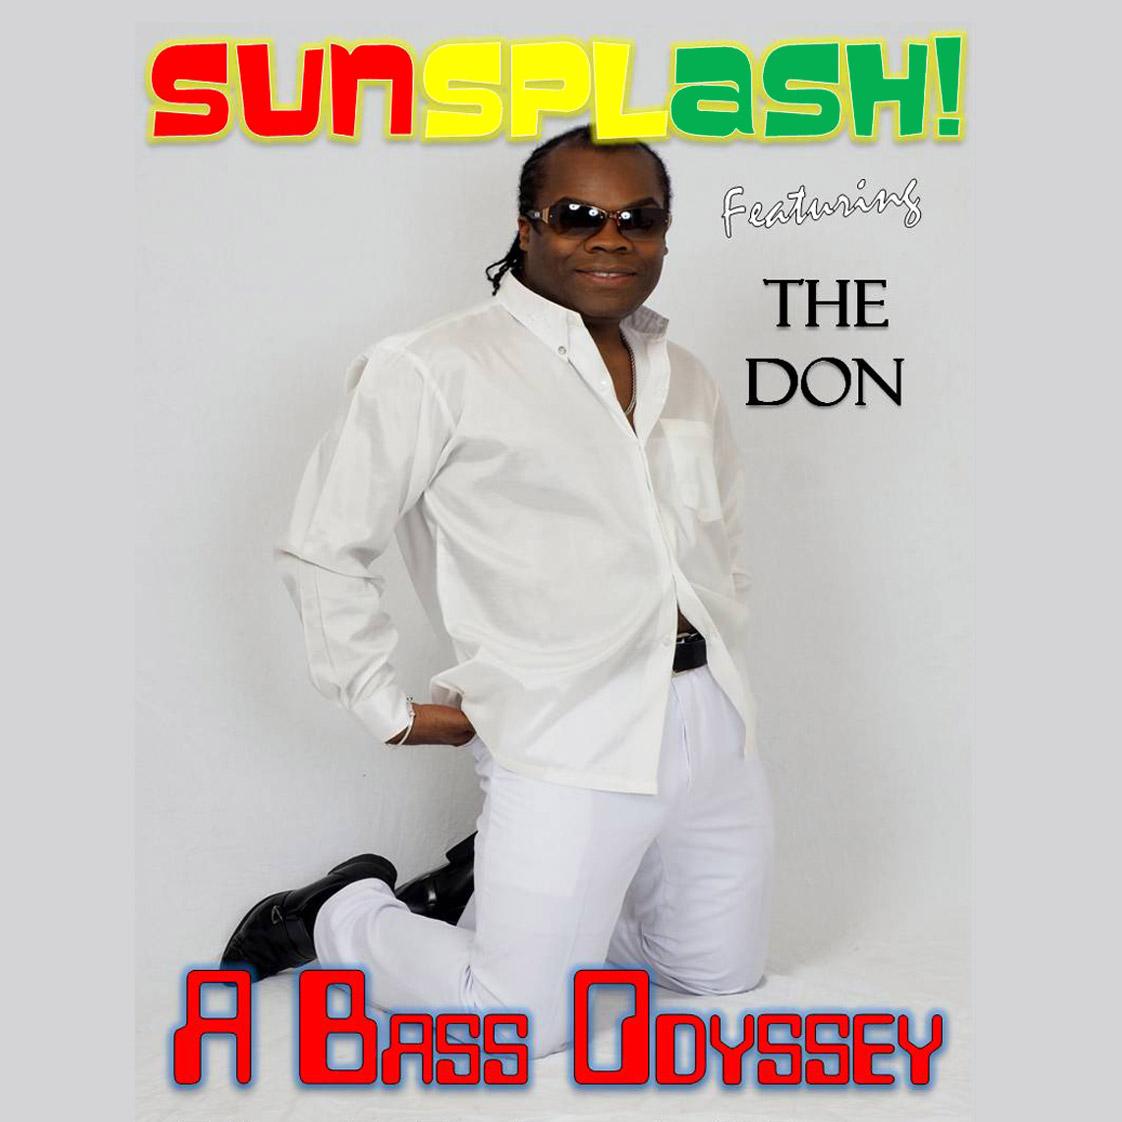 Sunsplash! Reggae tribute